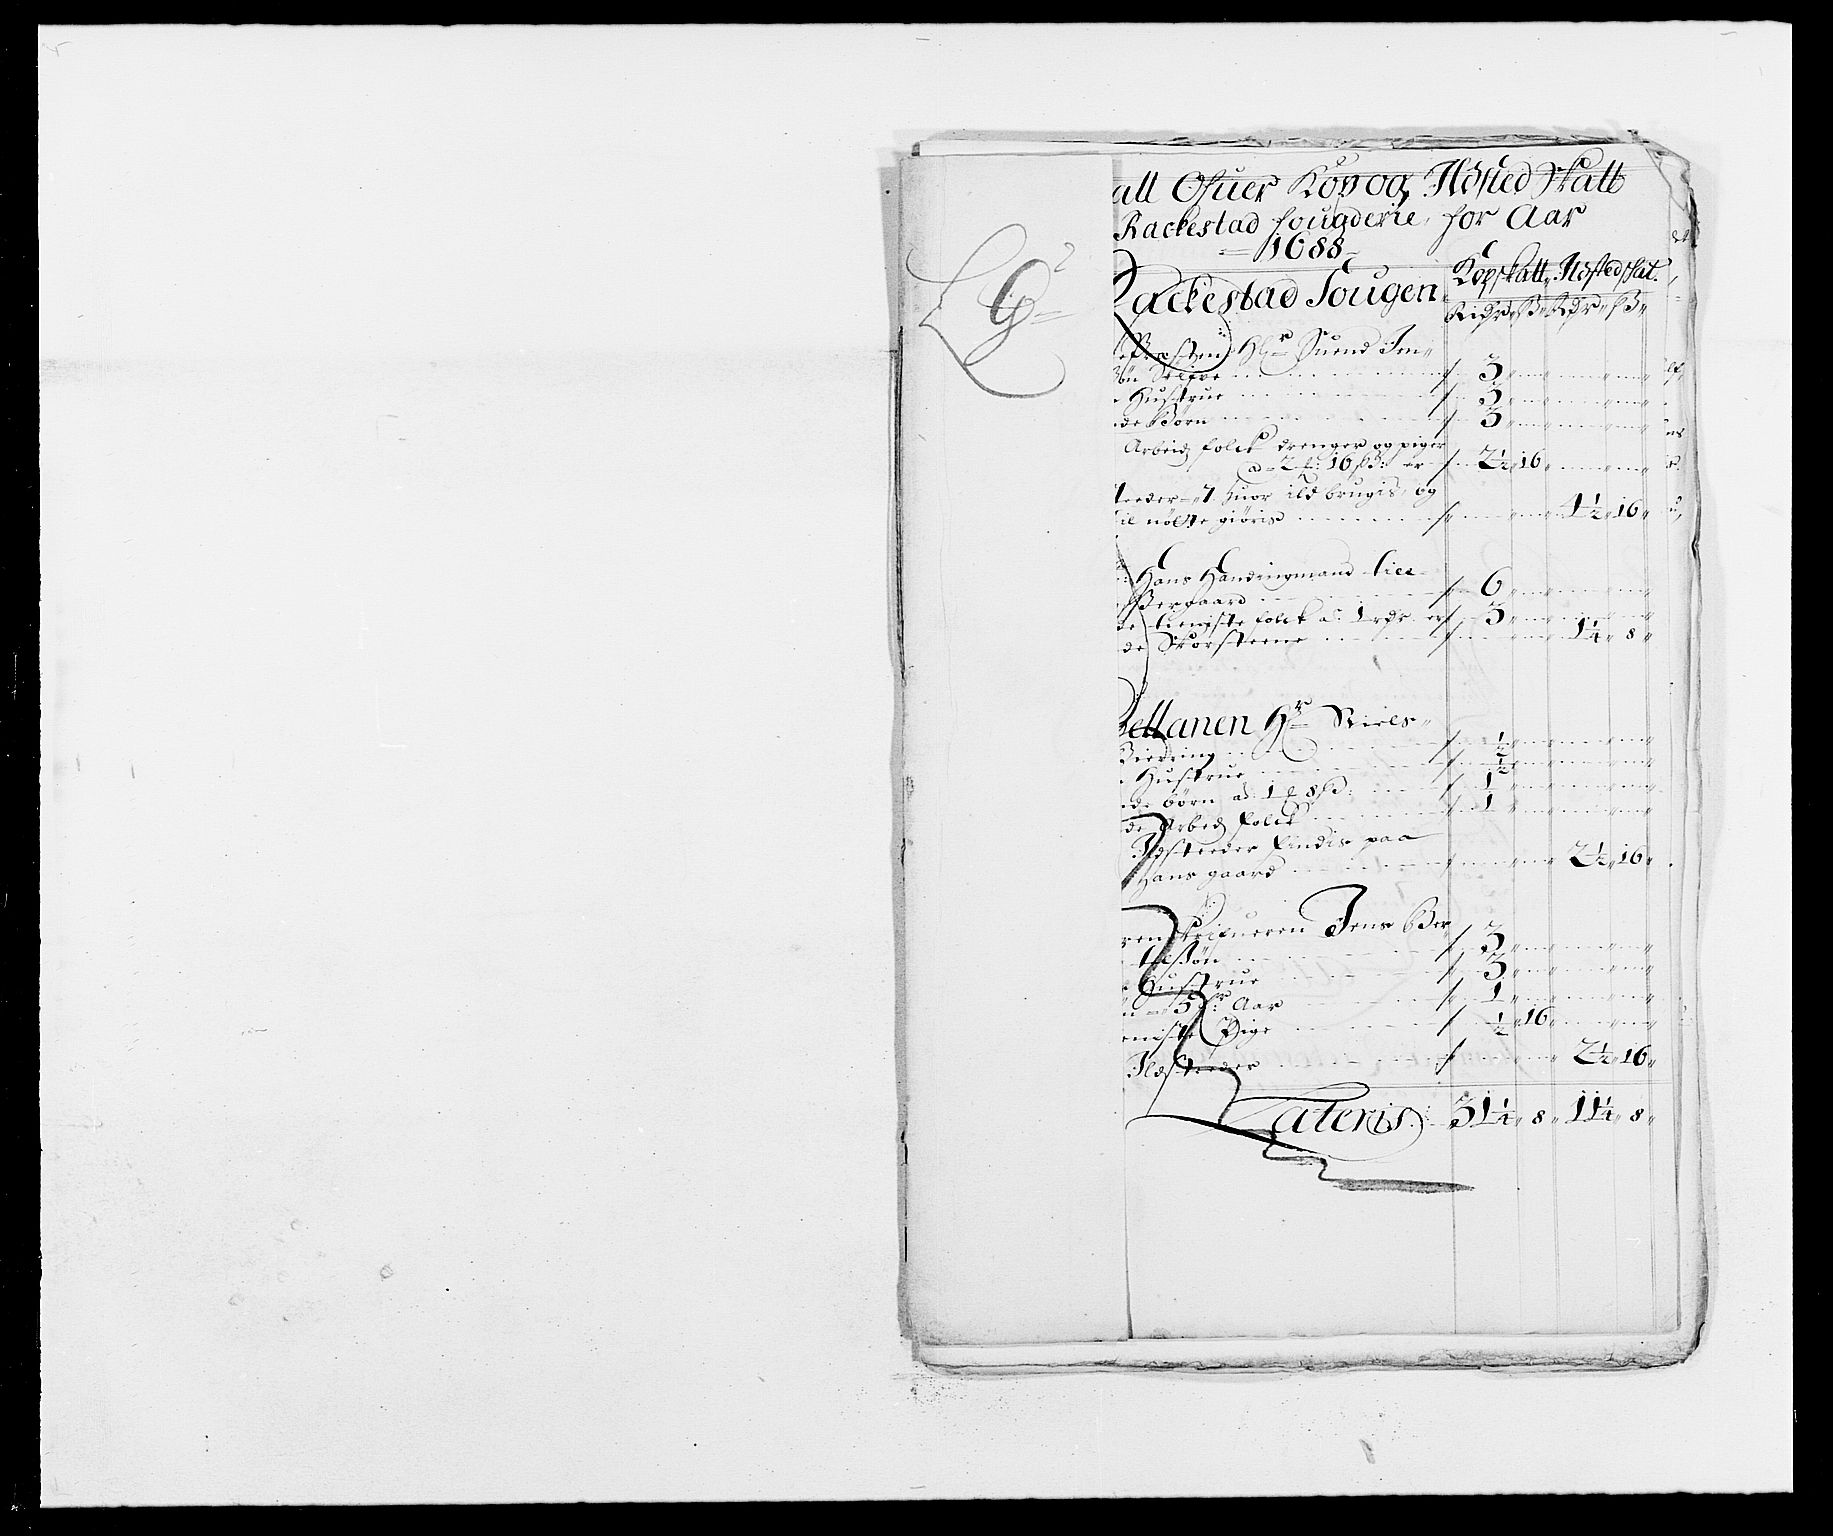 RA, Rentekammeret inntil 1814, Reviderte regnskaper, Fogderegnskap, R05/L0276: Fogderegnskap Rakkestad, 1683-1688, s. 236